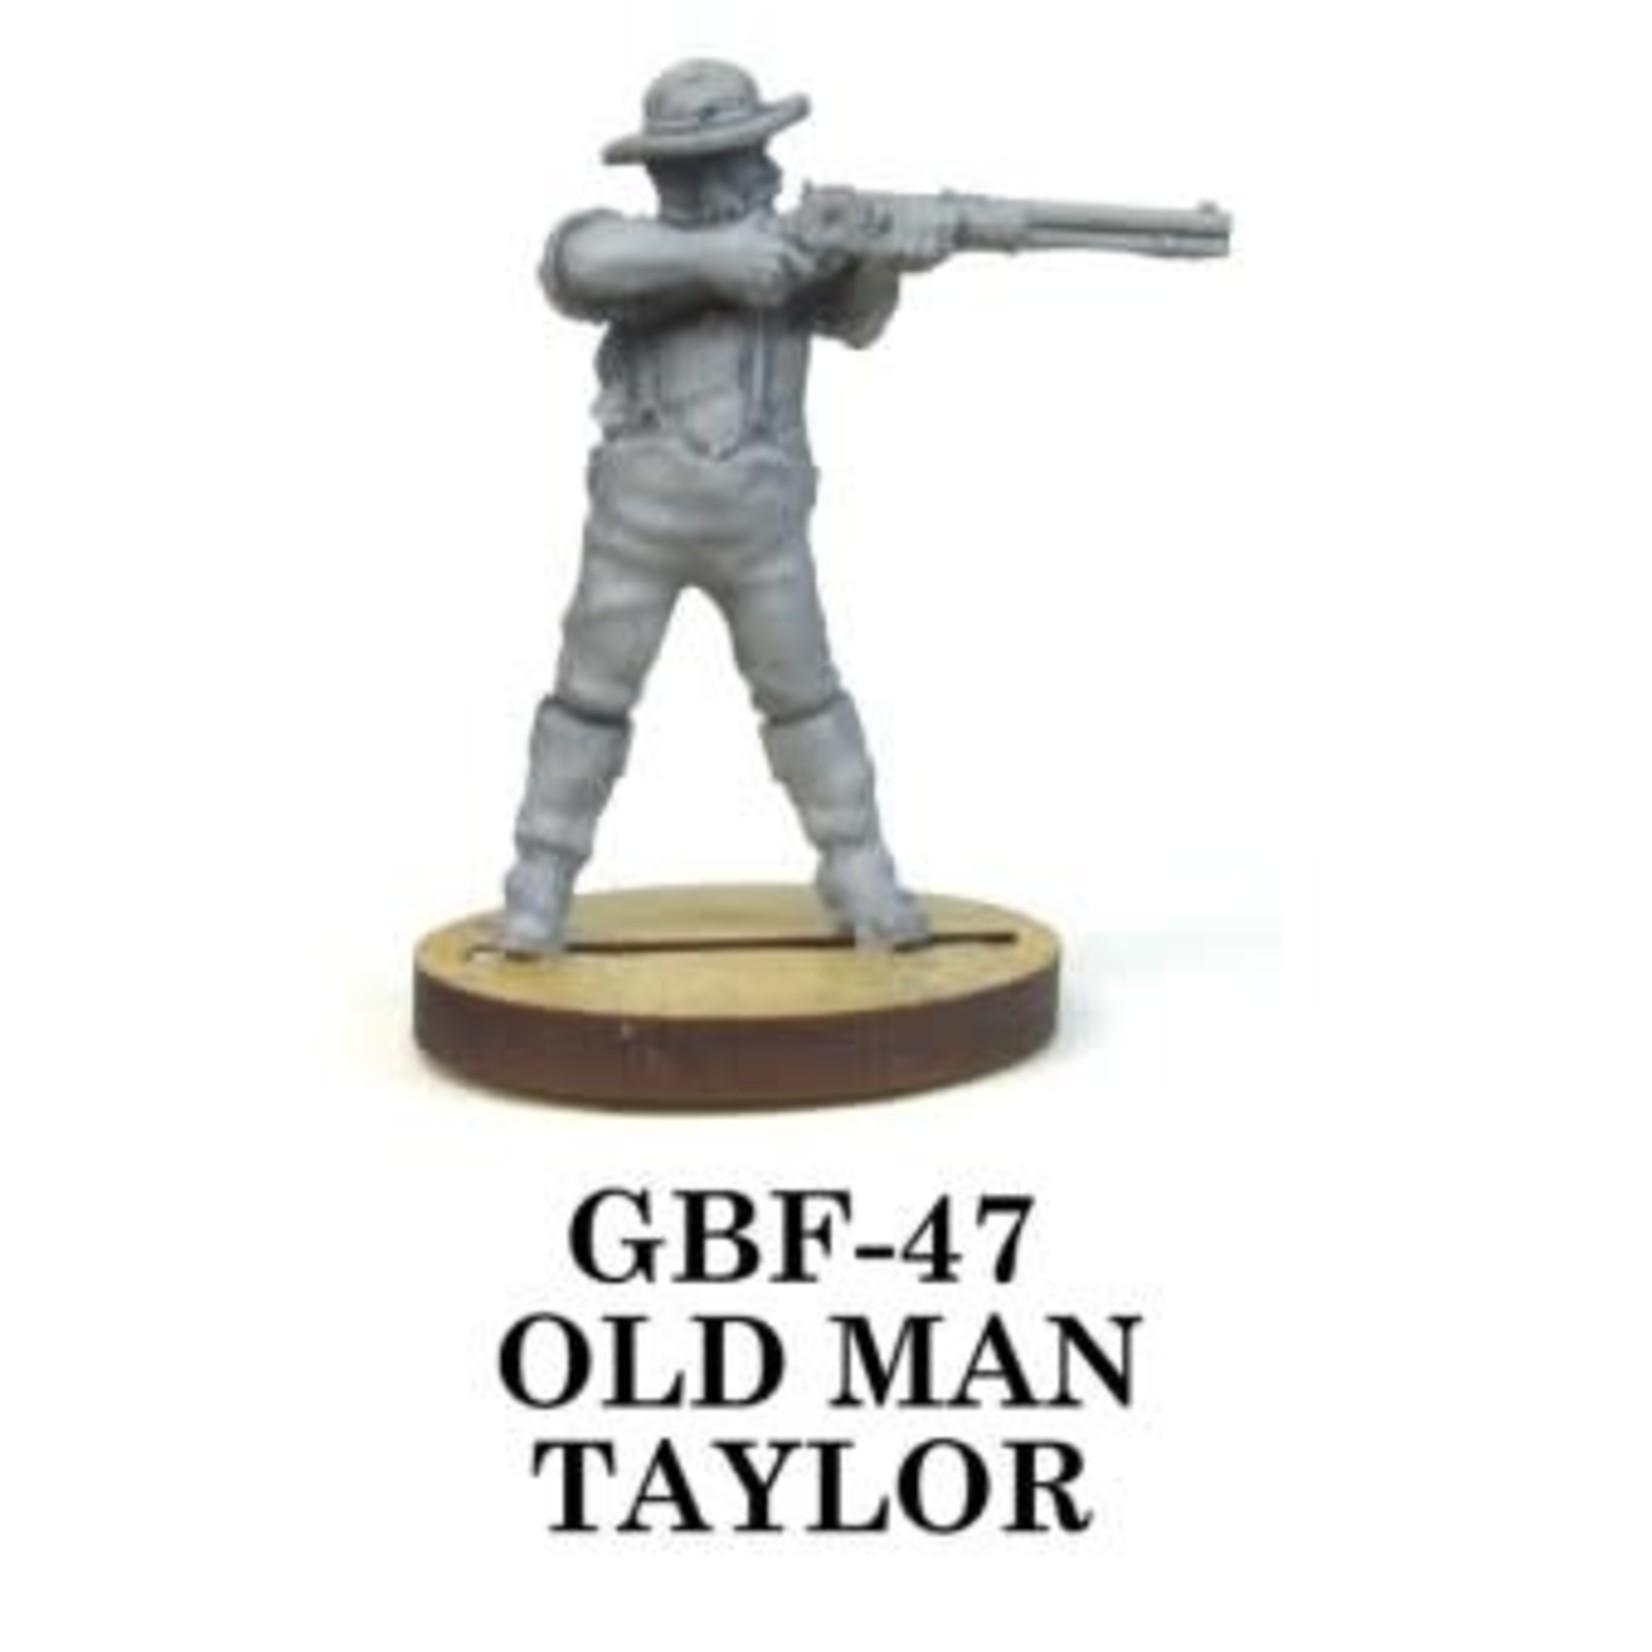 Old Man Taylor